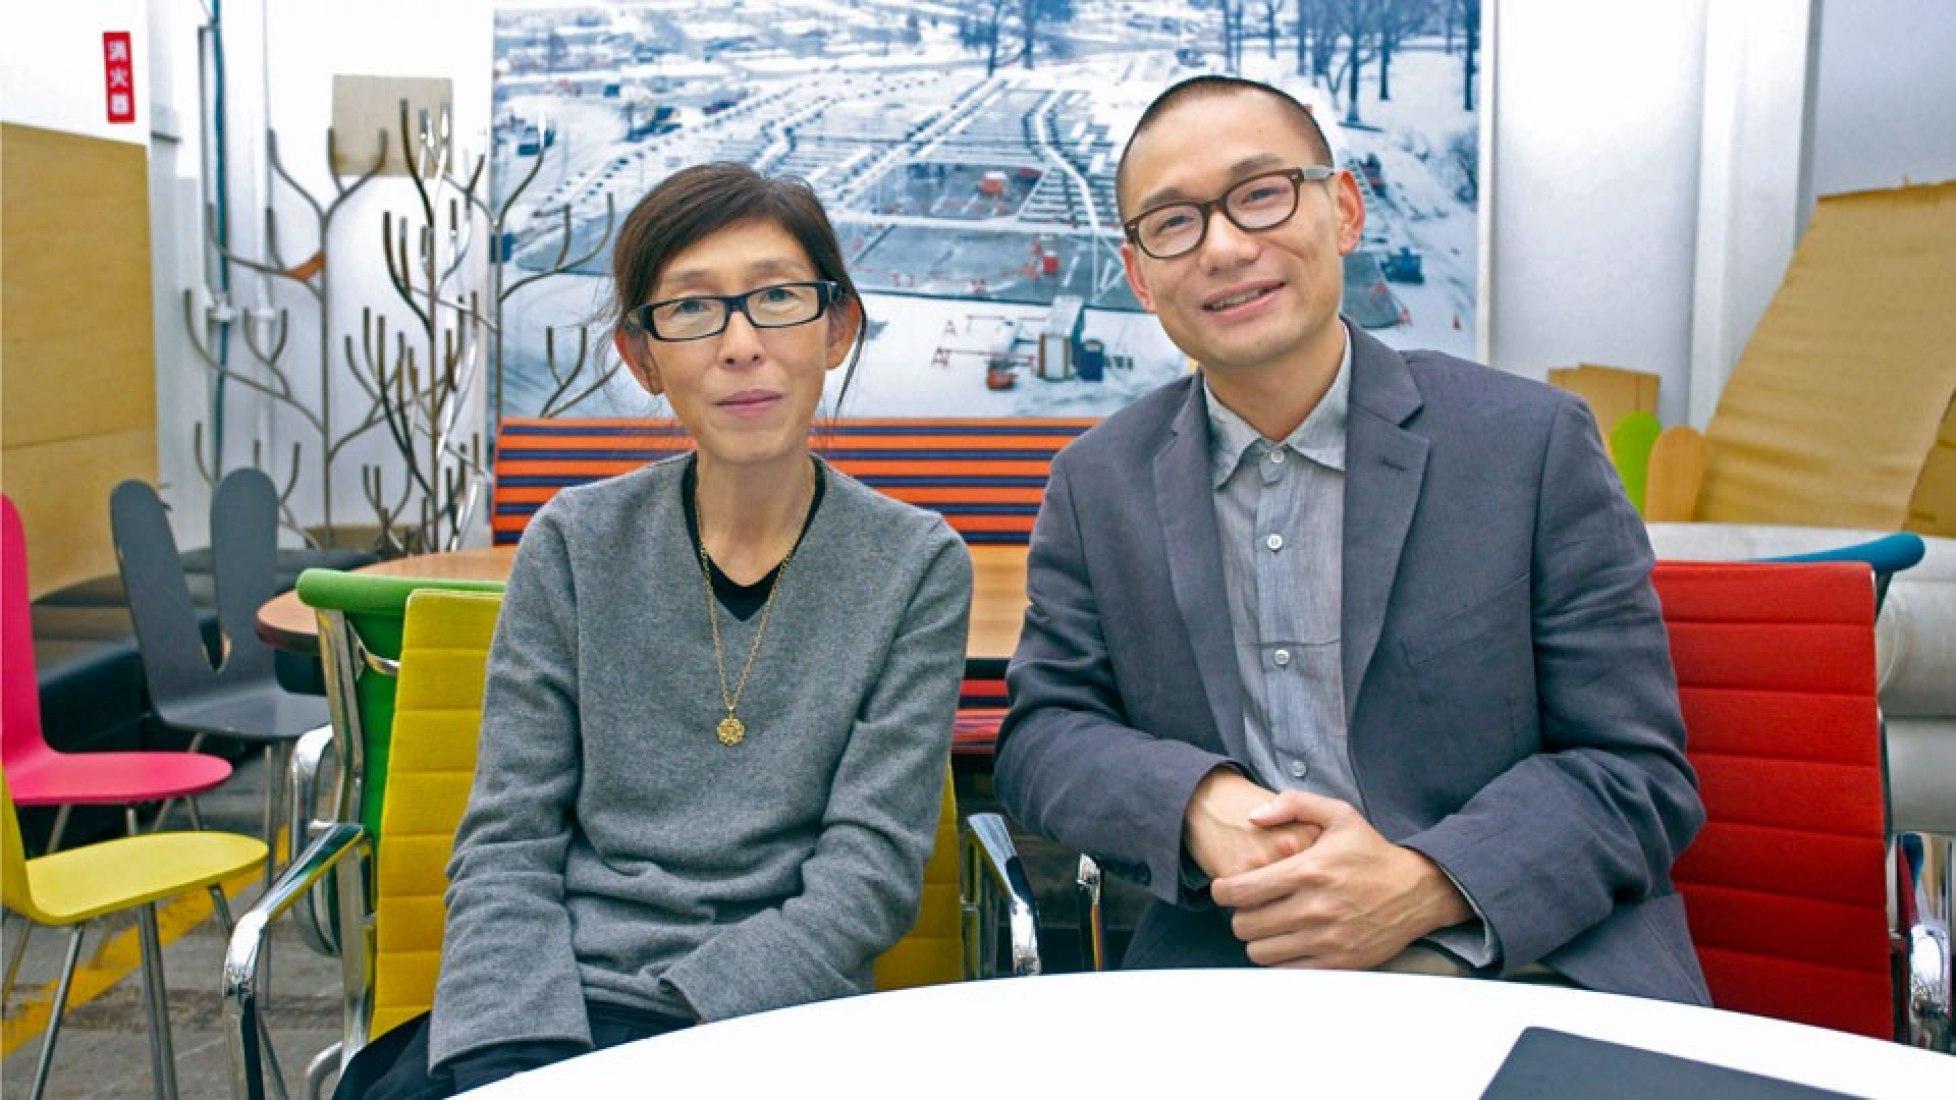 Kazuyo Sejima mentor y Yang Zhao protégé. Tokio, Japón, 2012. Fotografía.- Rolex/Hideki Shiozawa.